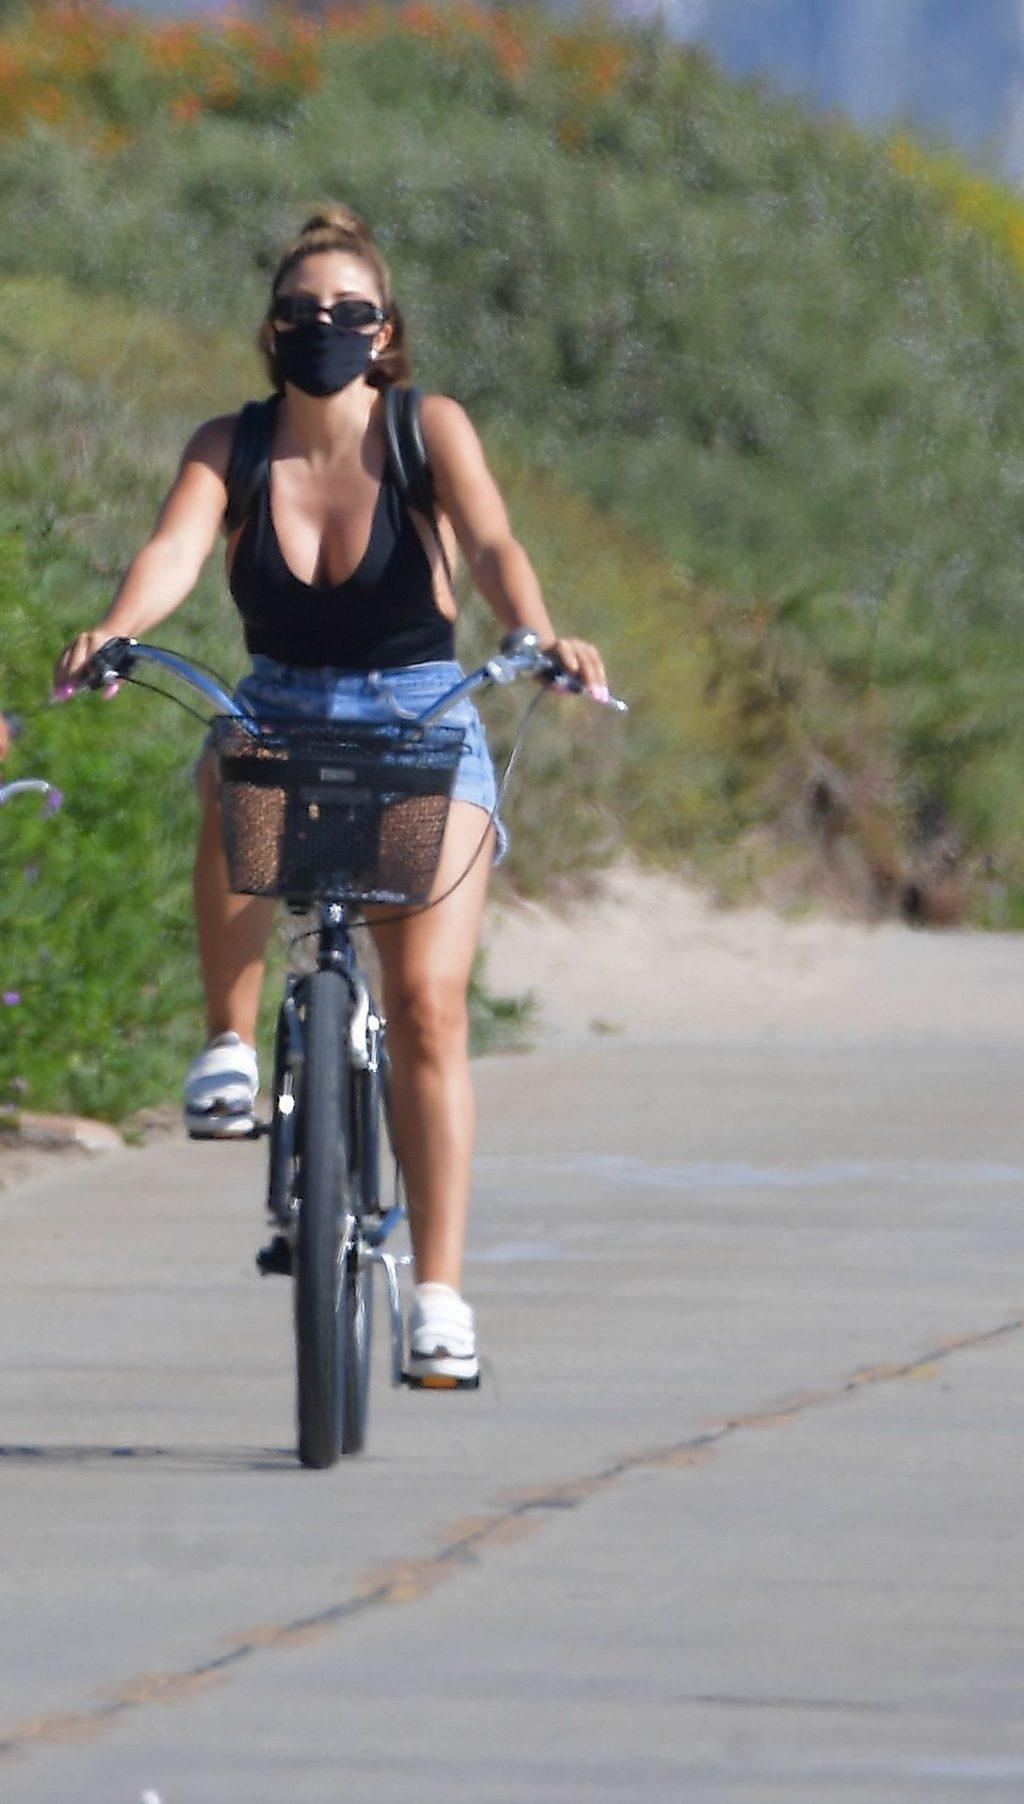 Larsa Pippen Puts On A Busty Display As She Rides Bikes In Manhattan Beach (14 Photos)